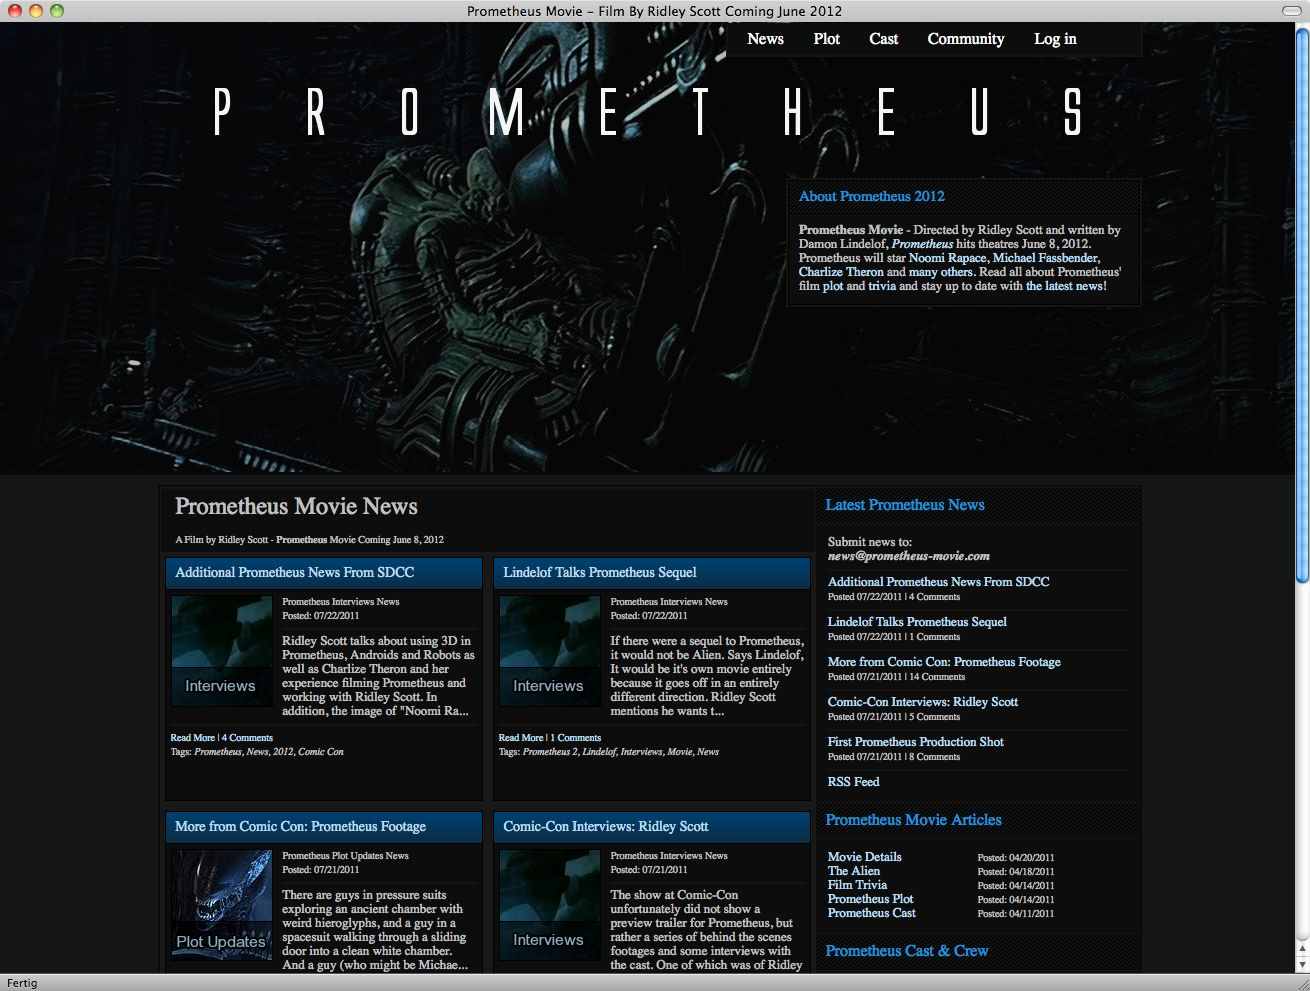 Screebshot/ Film/ Prometheus